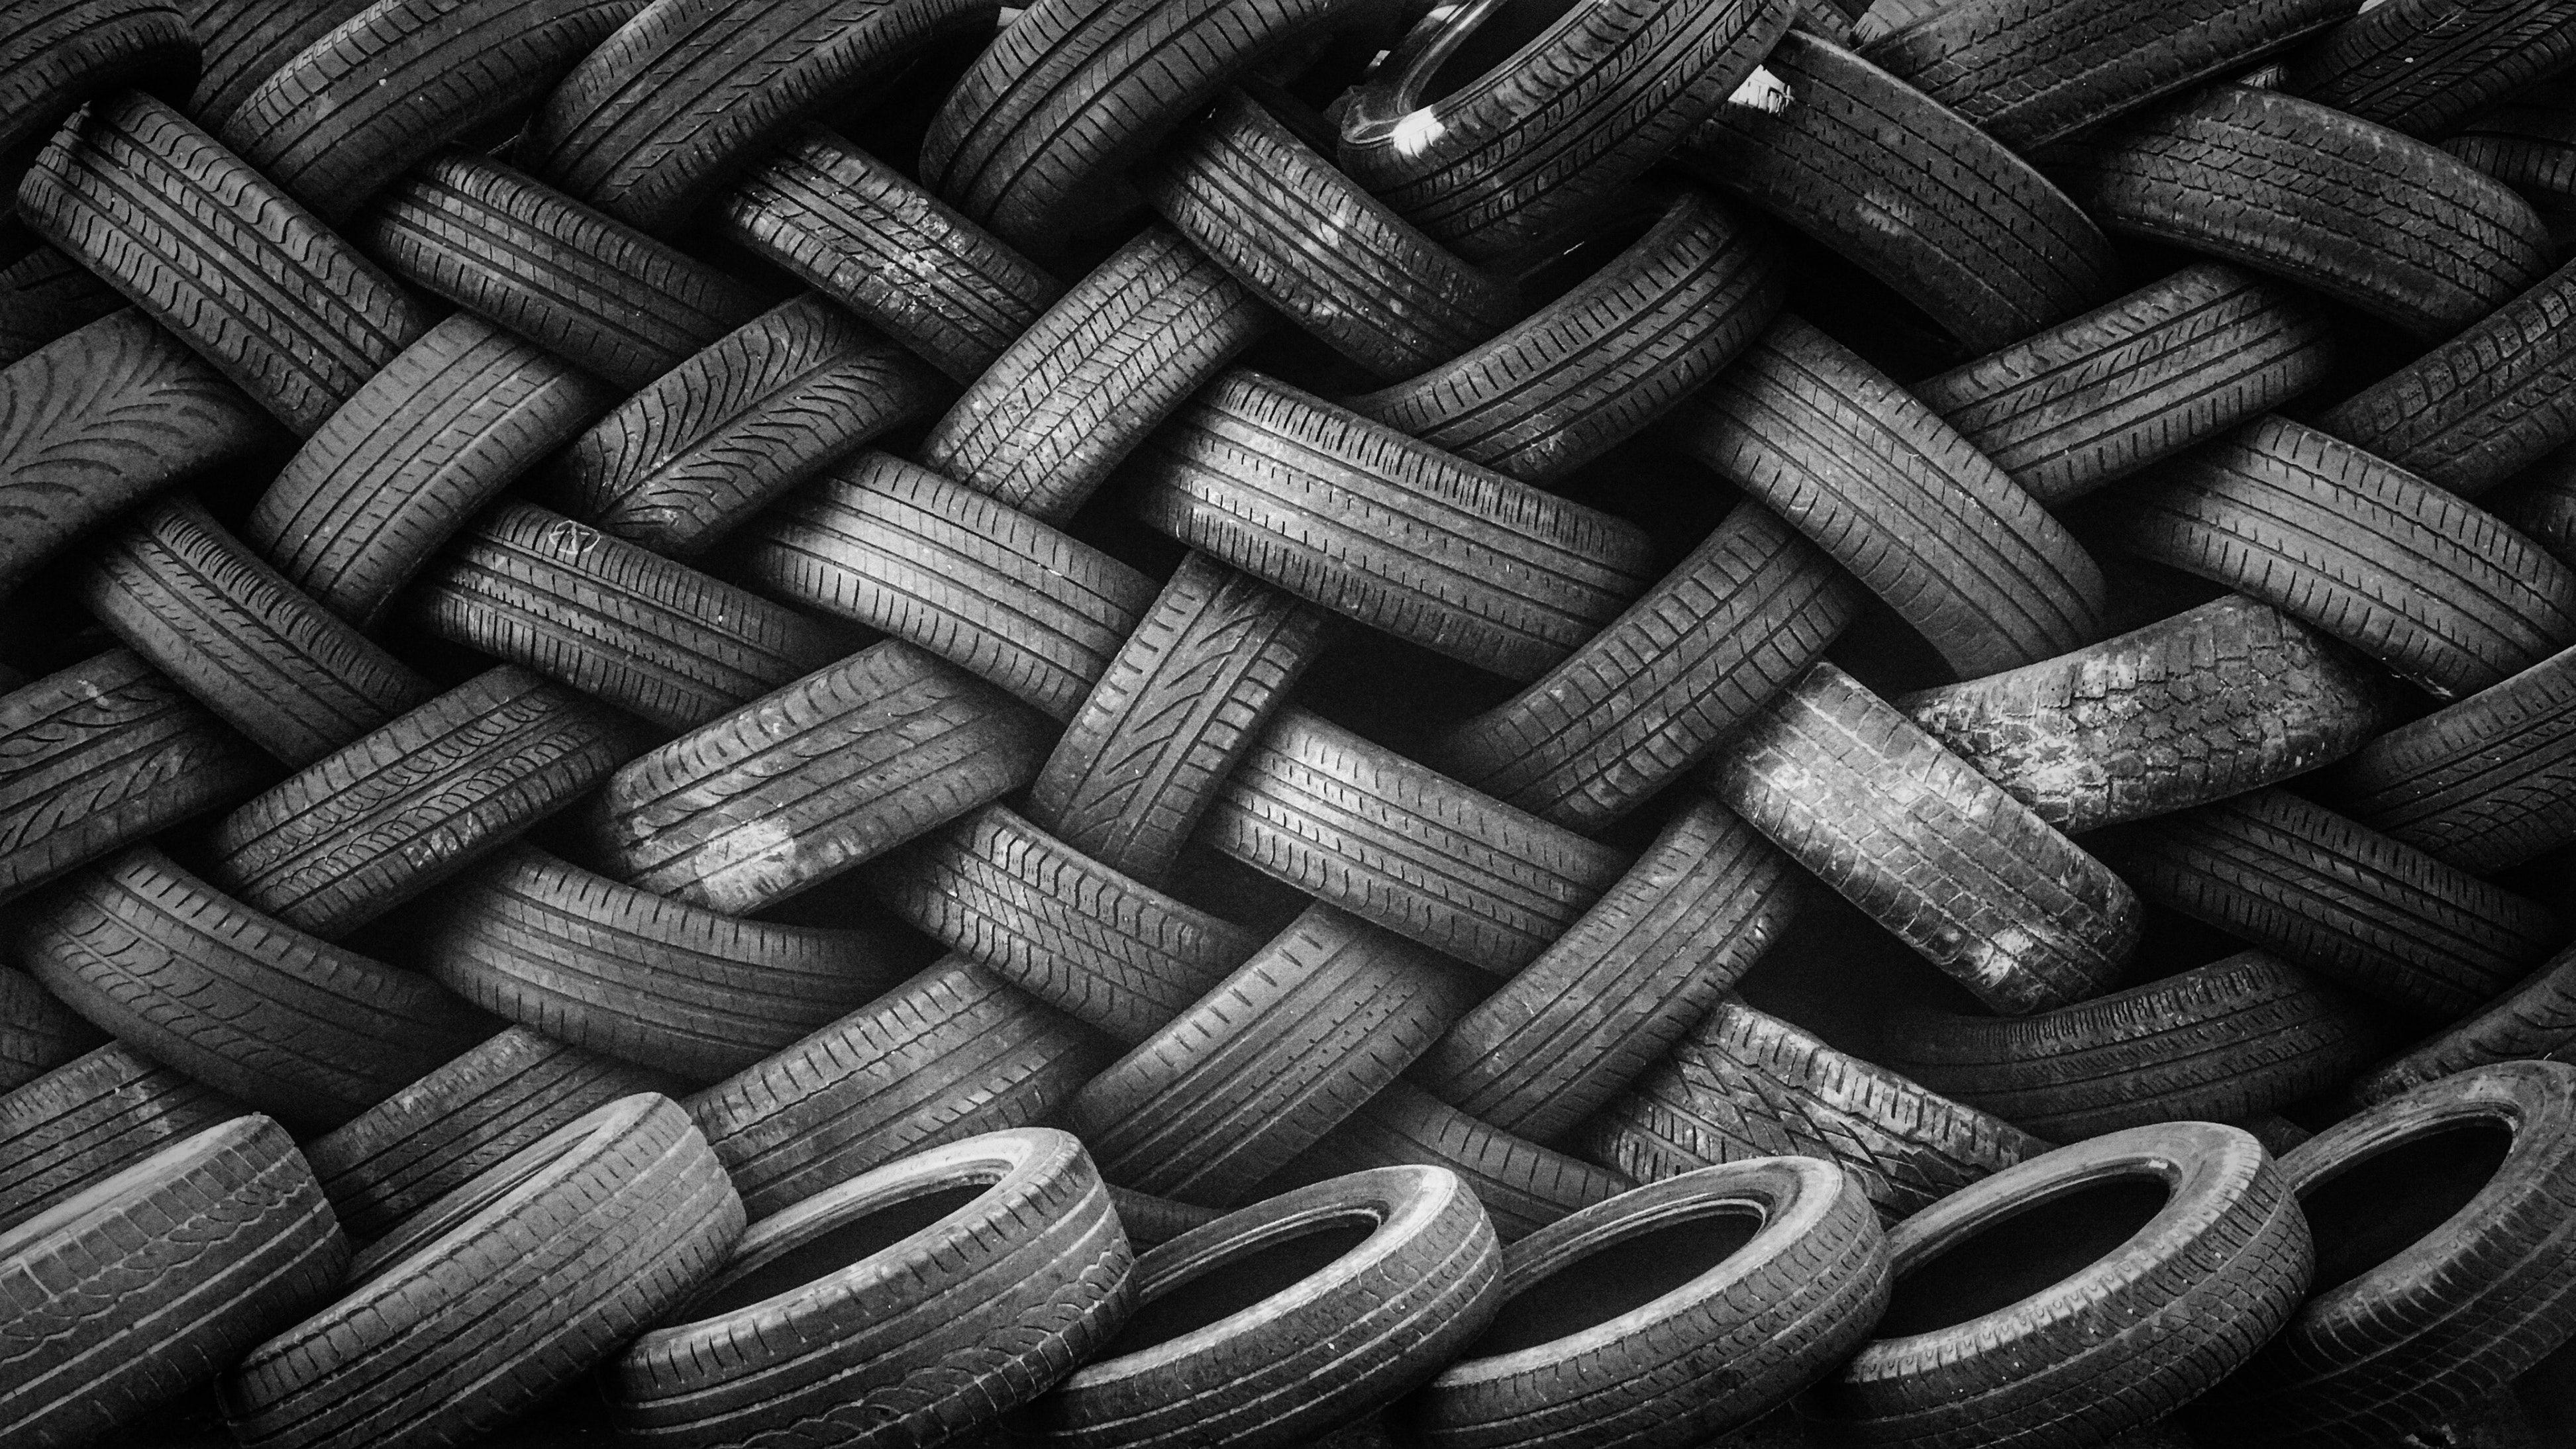 Monochrome tires wallpaper black wallpapers black background 3889x2188